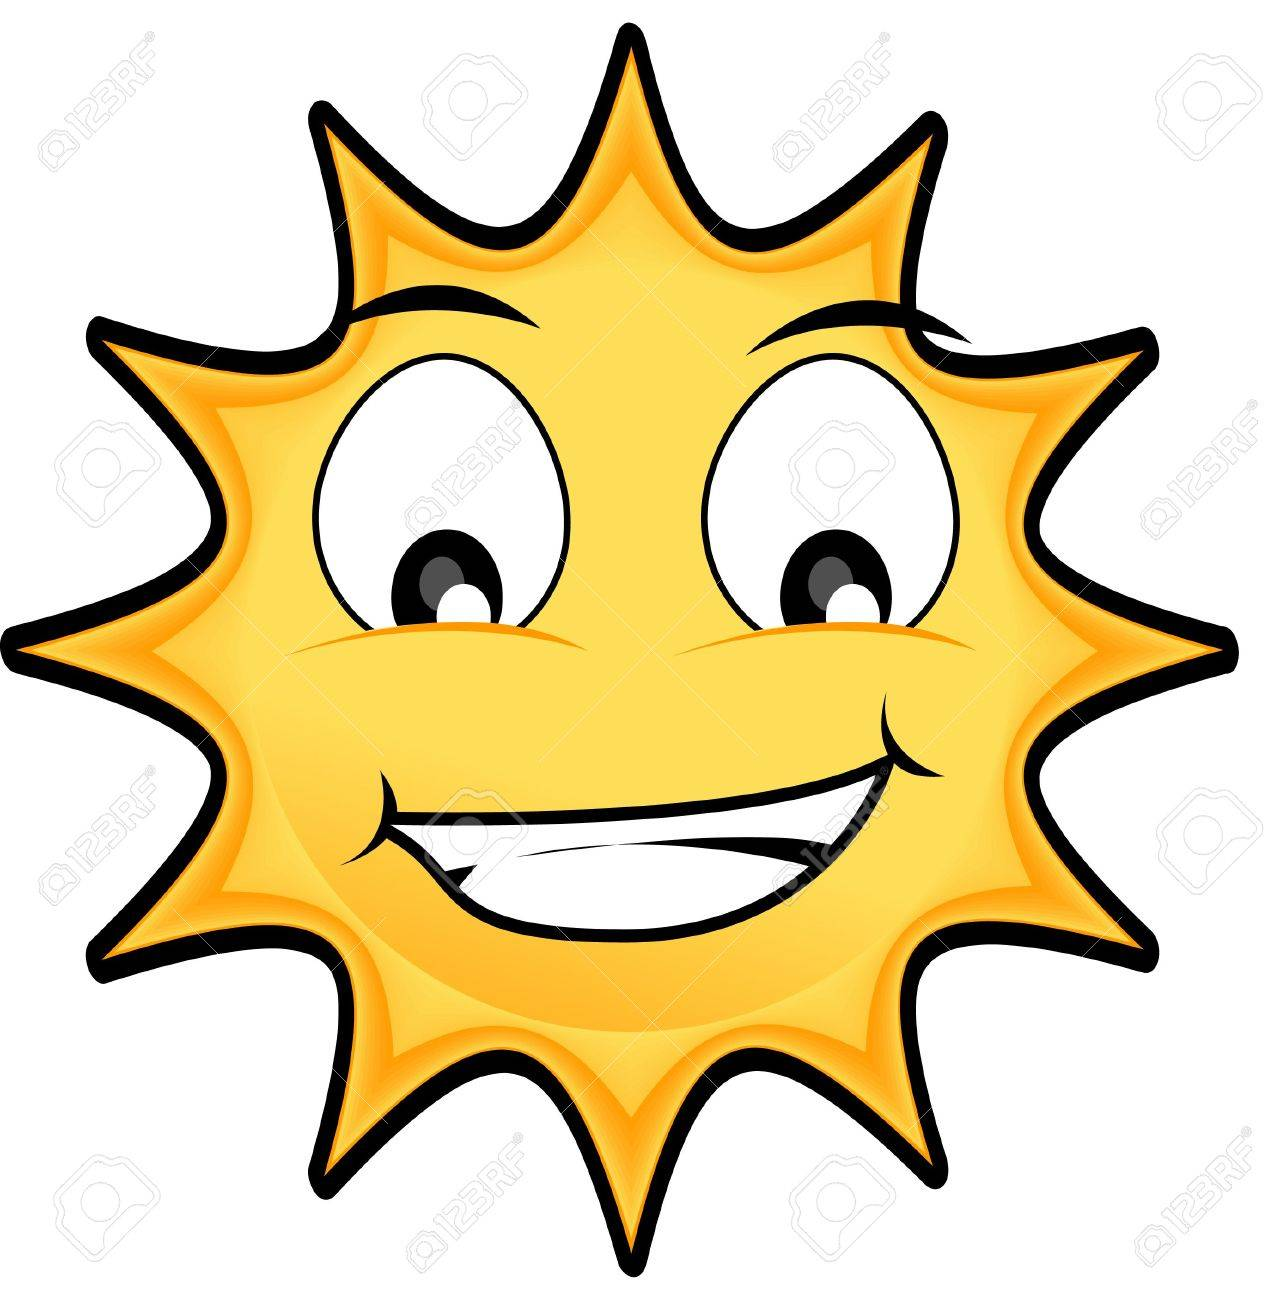 happy Sun illustration with big eyes Stock Illustration - 3205823